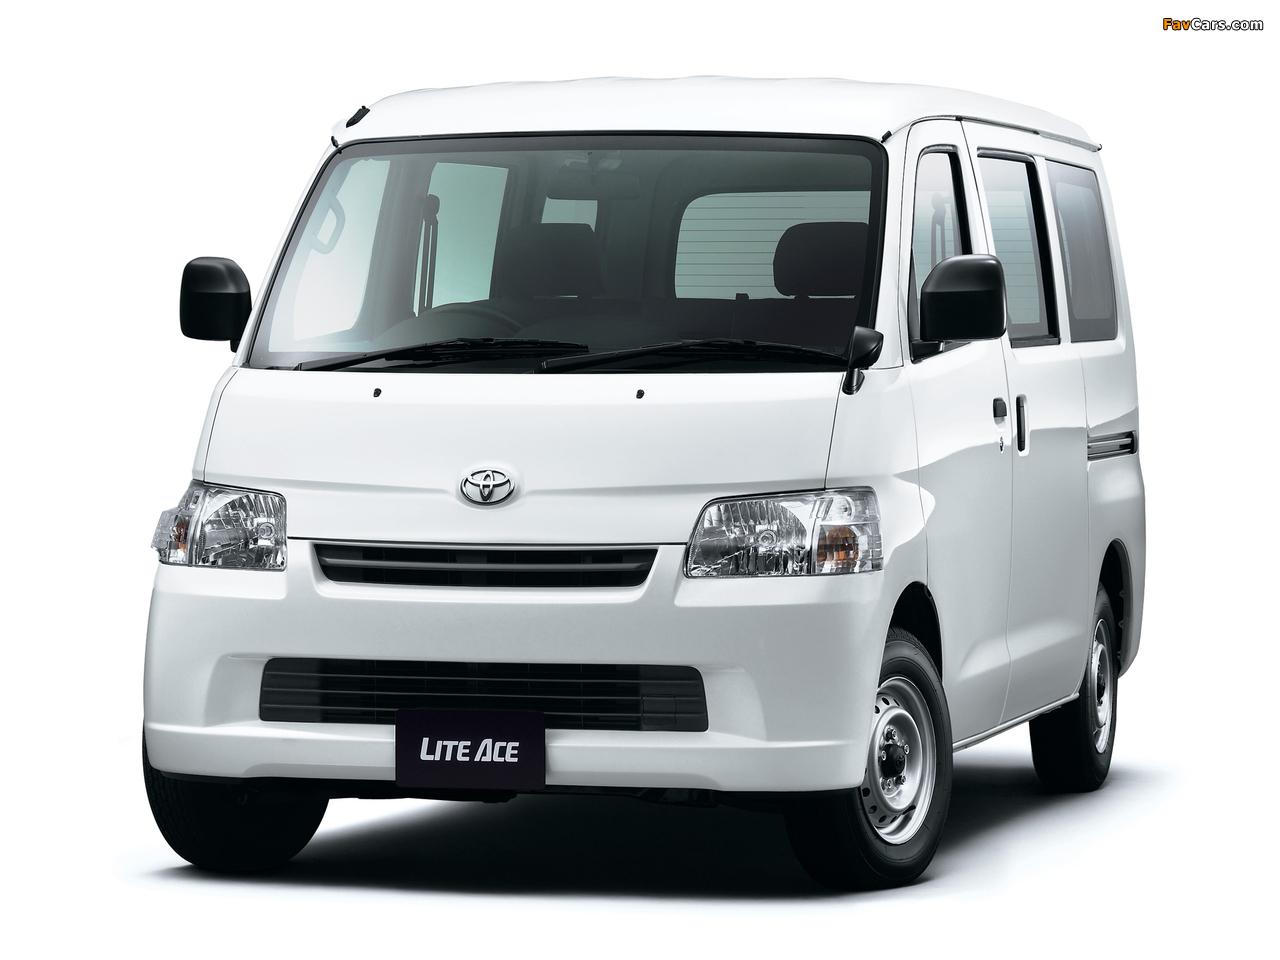 Kelebihan Toyota Lite Ace Spesifikasi